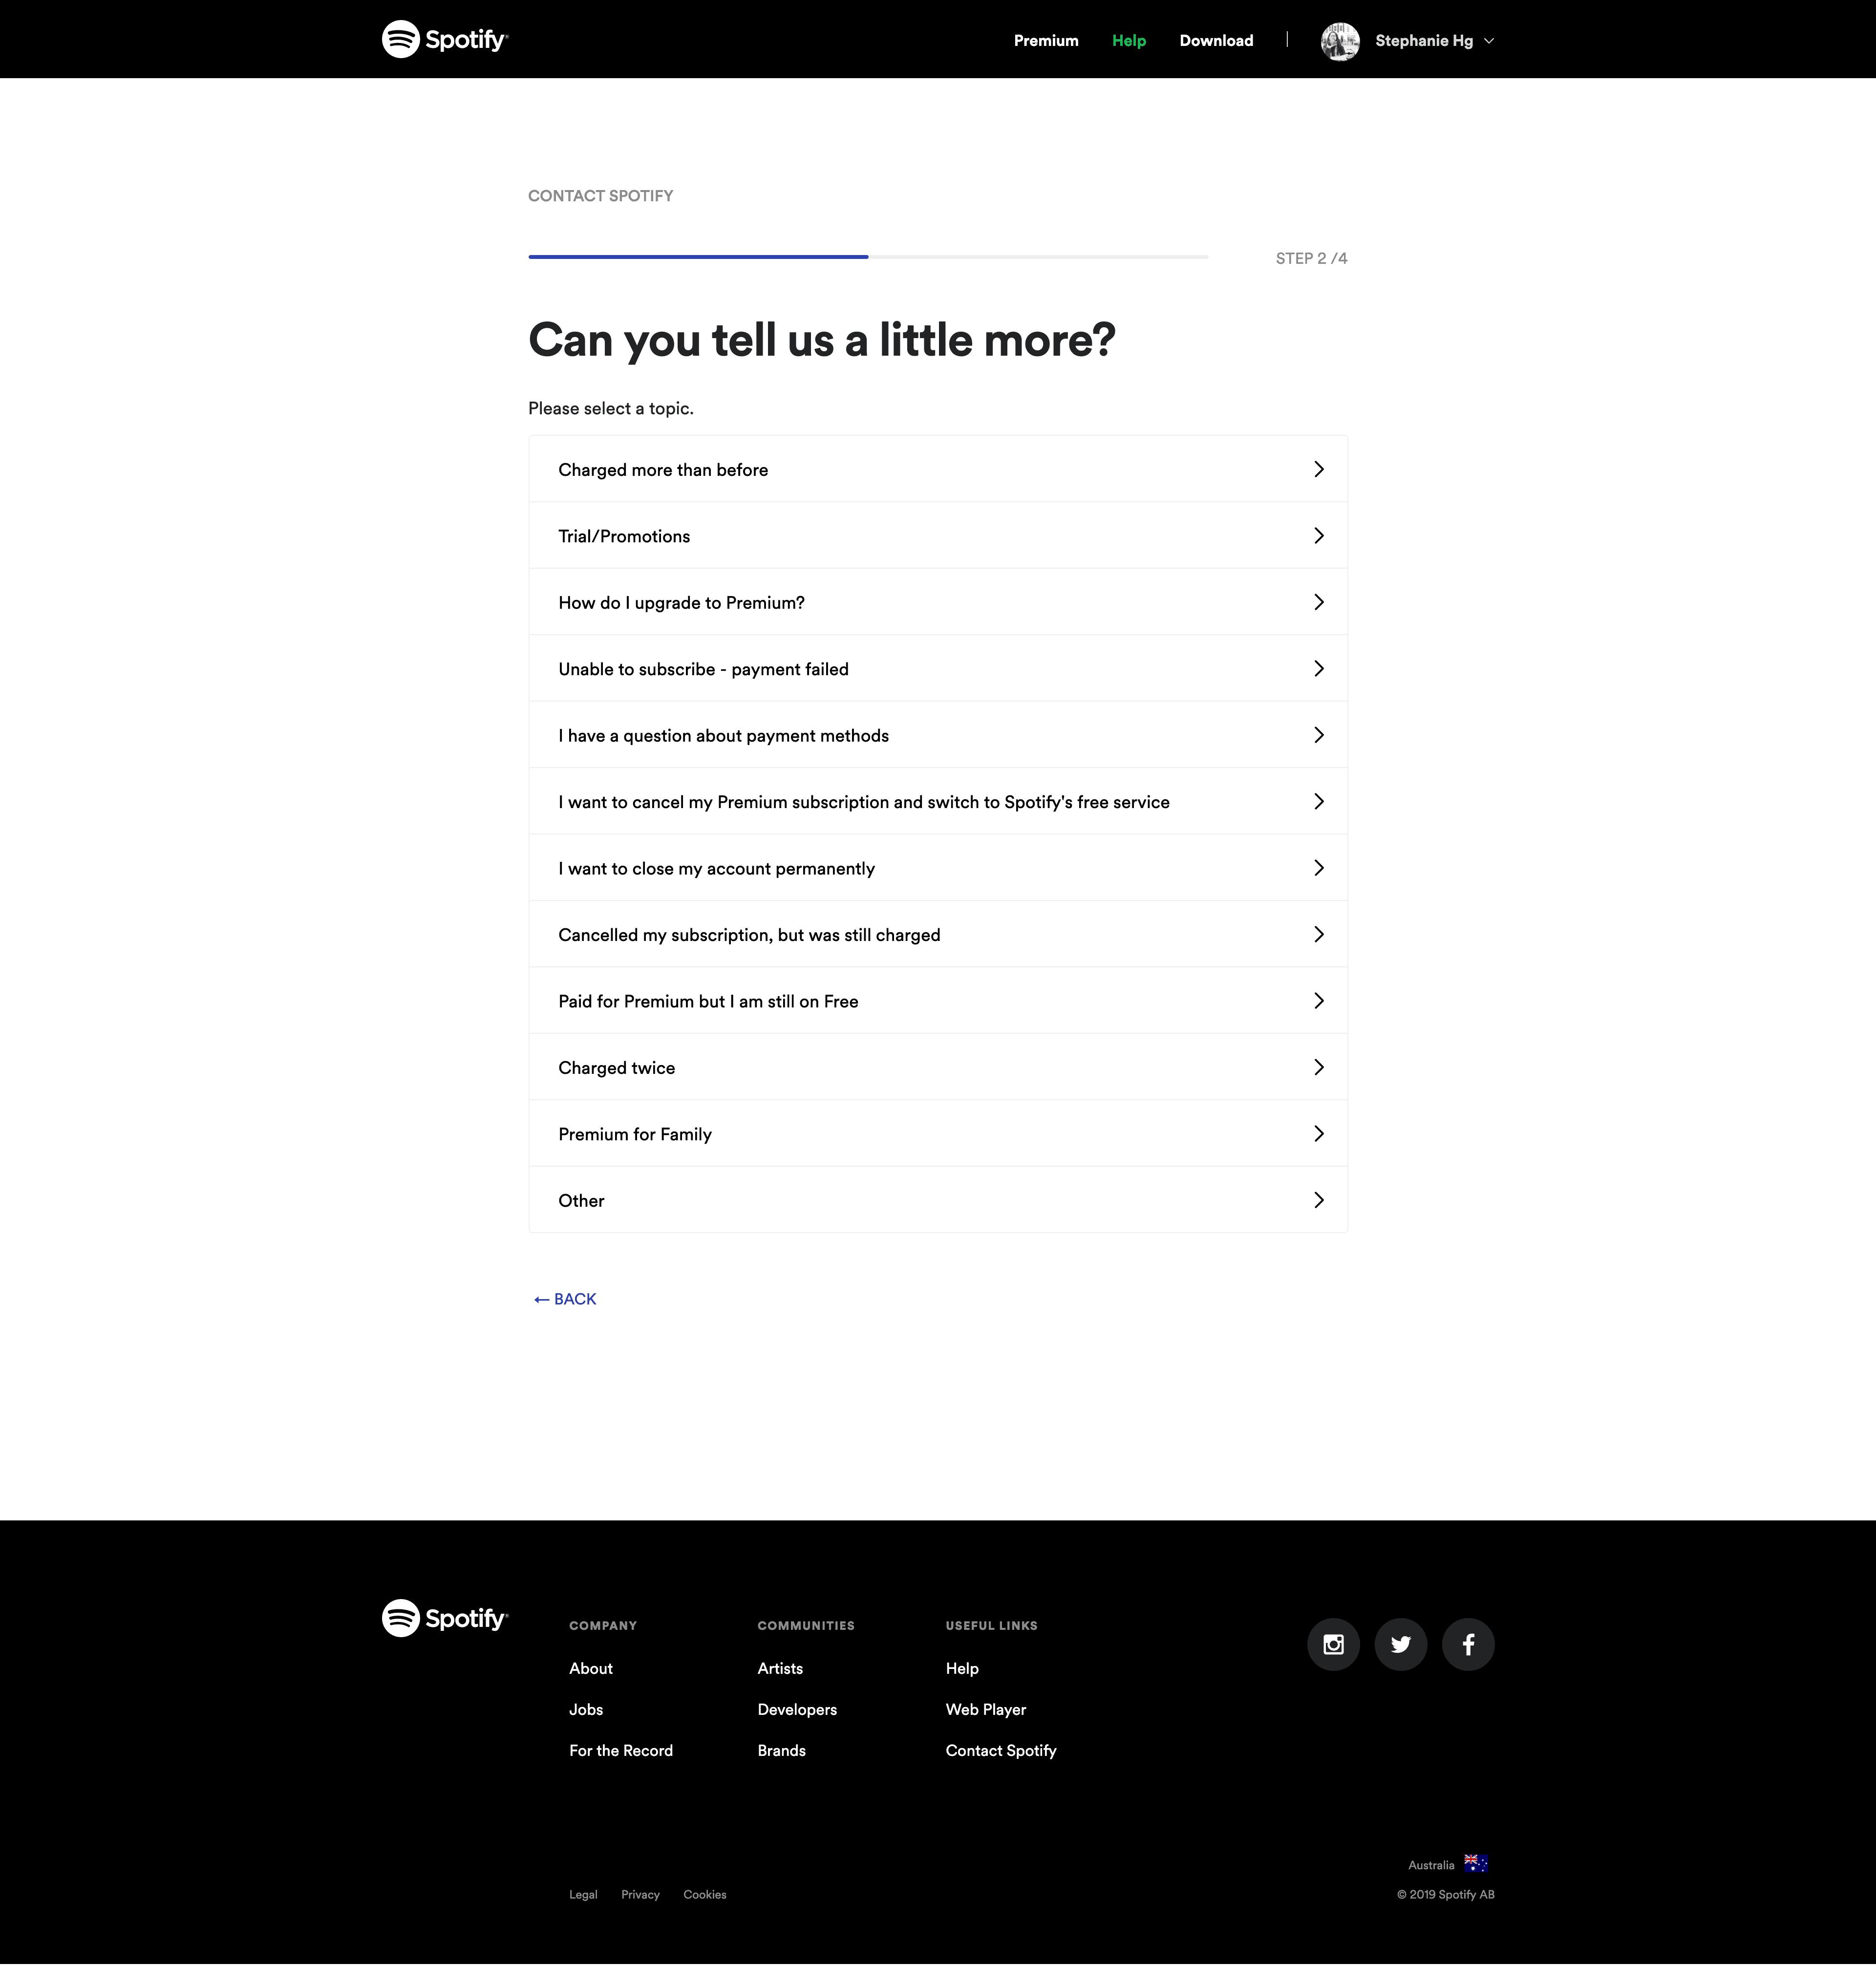 Help Center (step 2) by Spotify